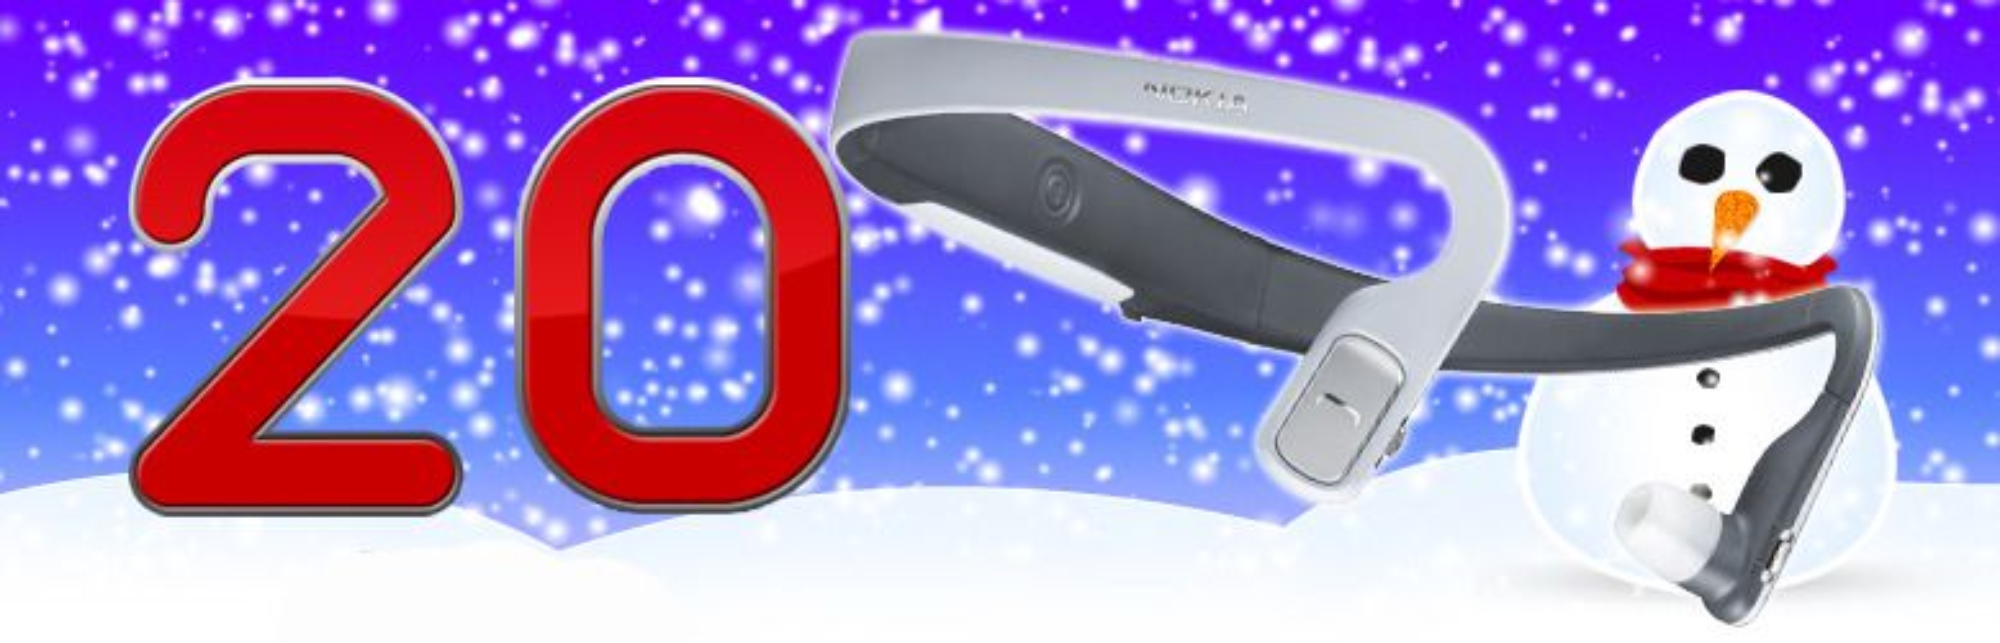 Mobilis julekalender - luke 20